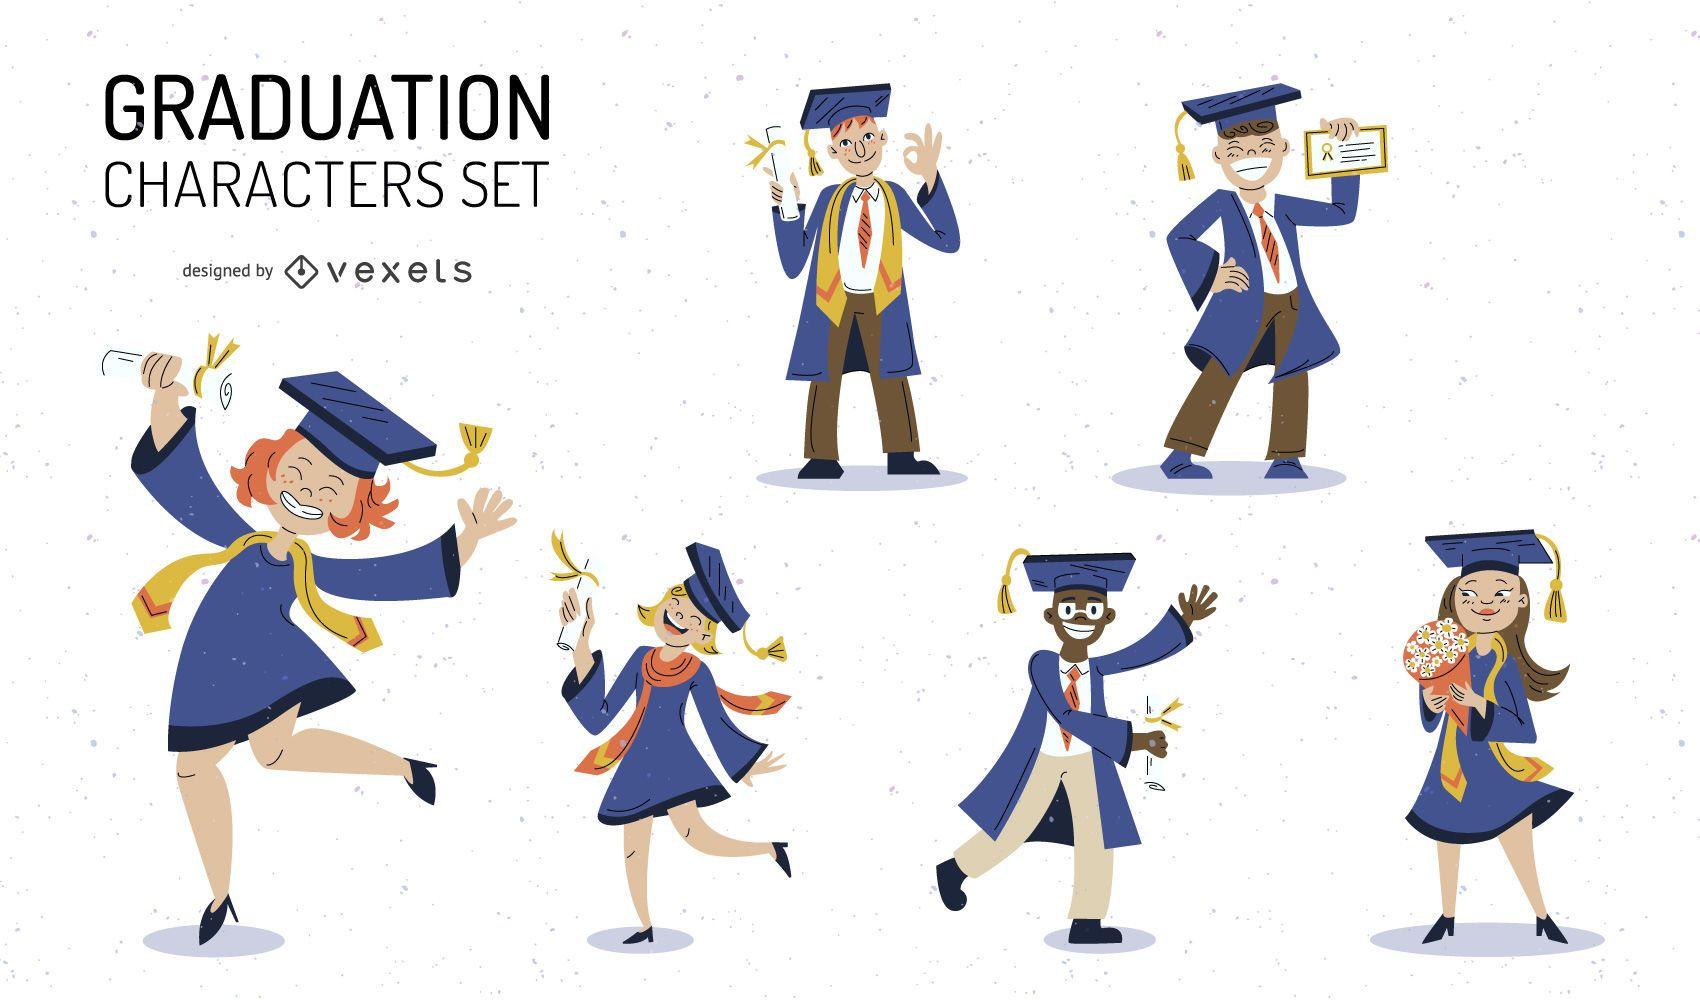 Graduation character set